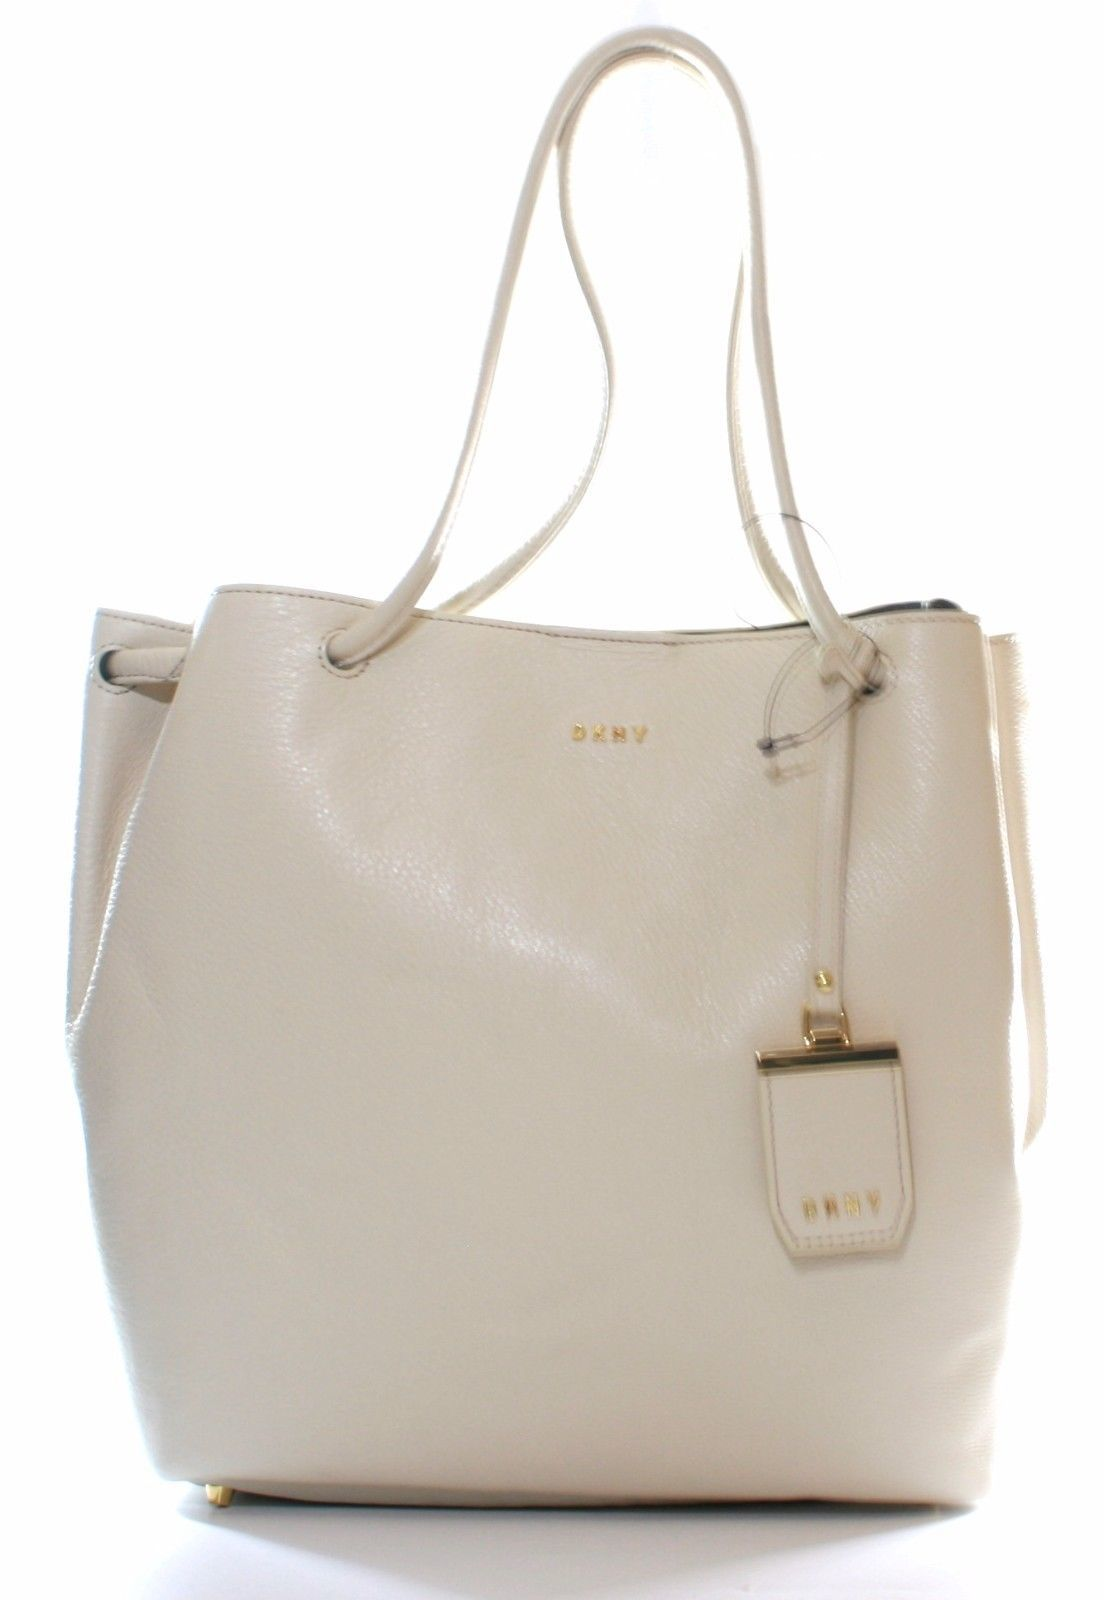 DKNY Donna Karan Sand Dollar Cream Leather Shoulder Bag Medium Handbag